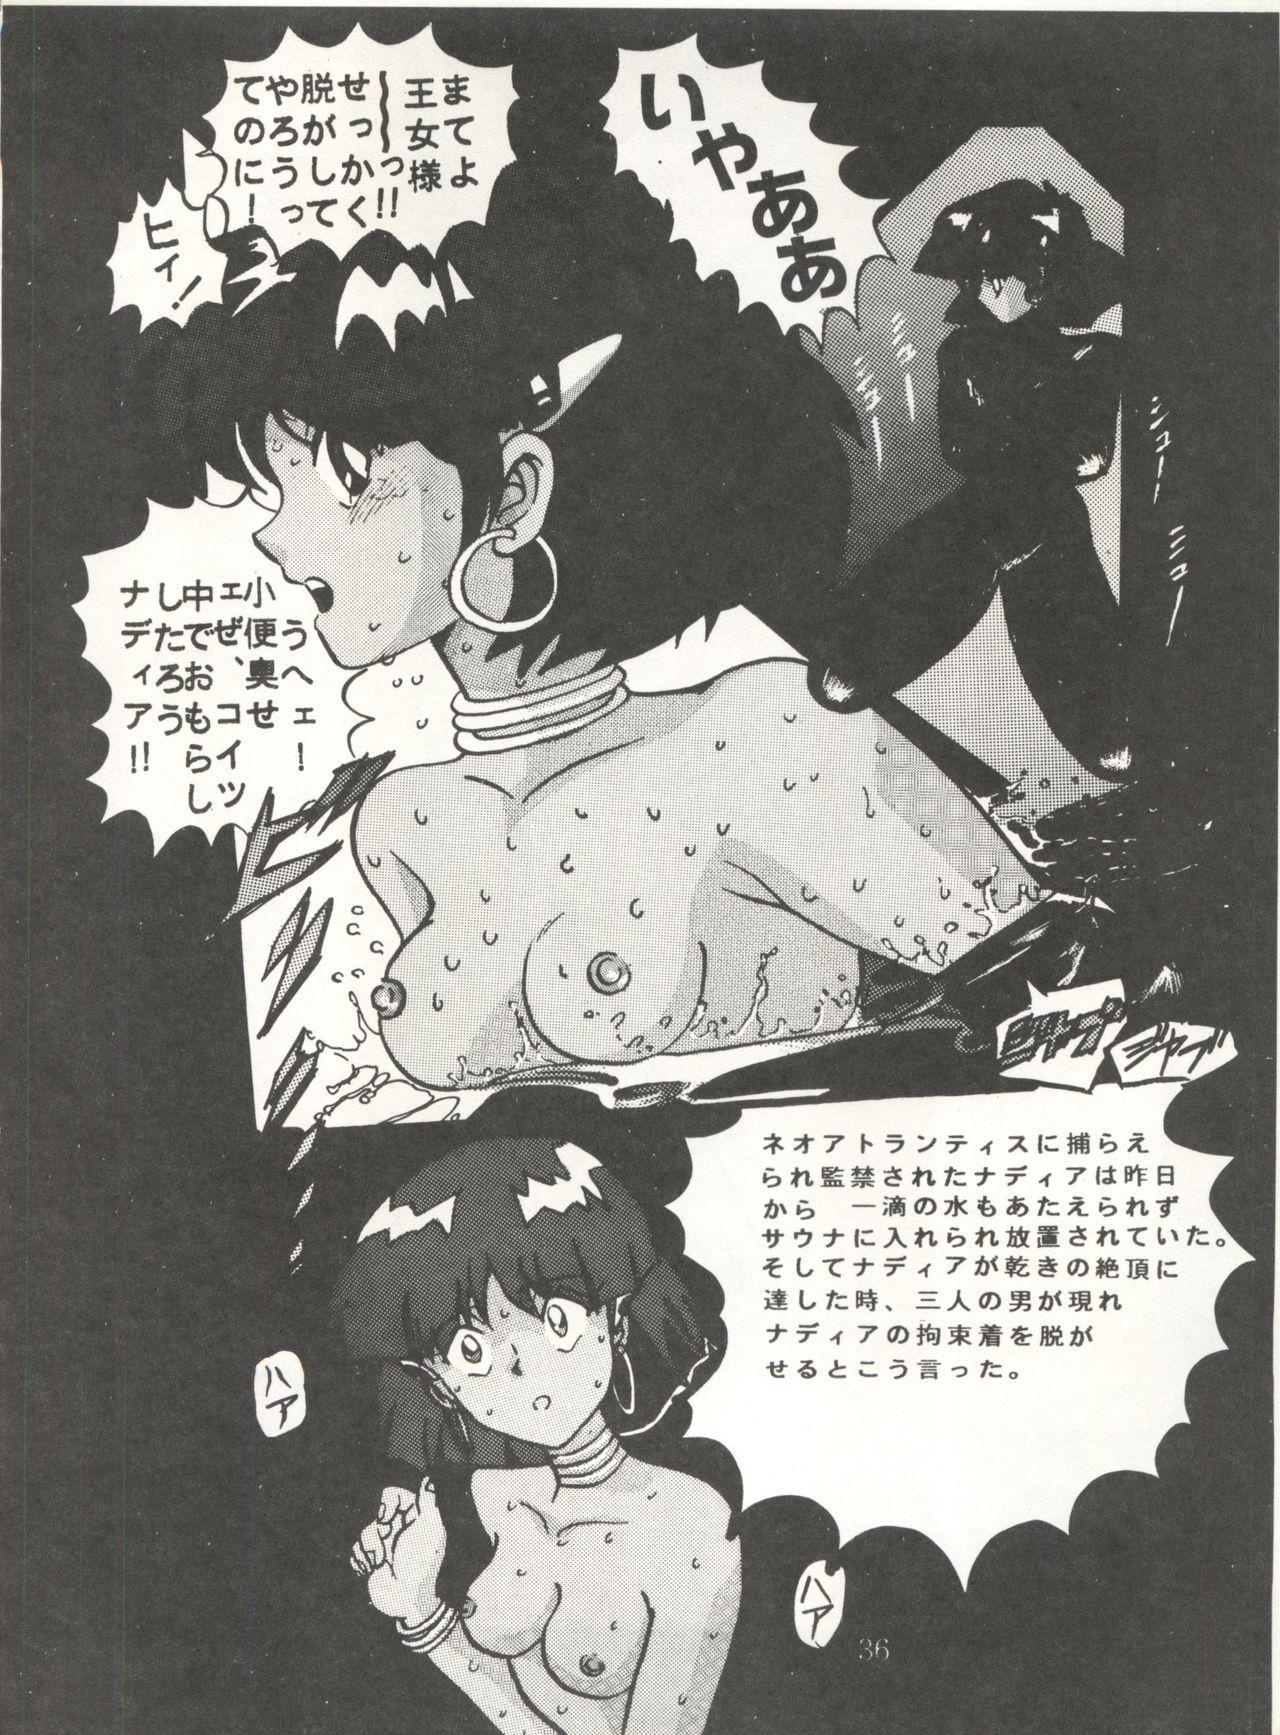 [Global One (MARO)] Sadistic 5 (Cutey Honey, Devilman, Sailor Moon), [Global One (MARO)] Sadistic (Dirty Pair, Fushigi no Umi no Nadia, Sailor Moon), [Studio Ikkatsumajin] .ribbon (Hime-chan's Ribbon) 95